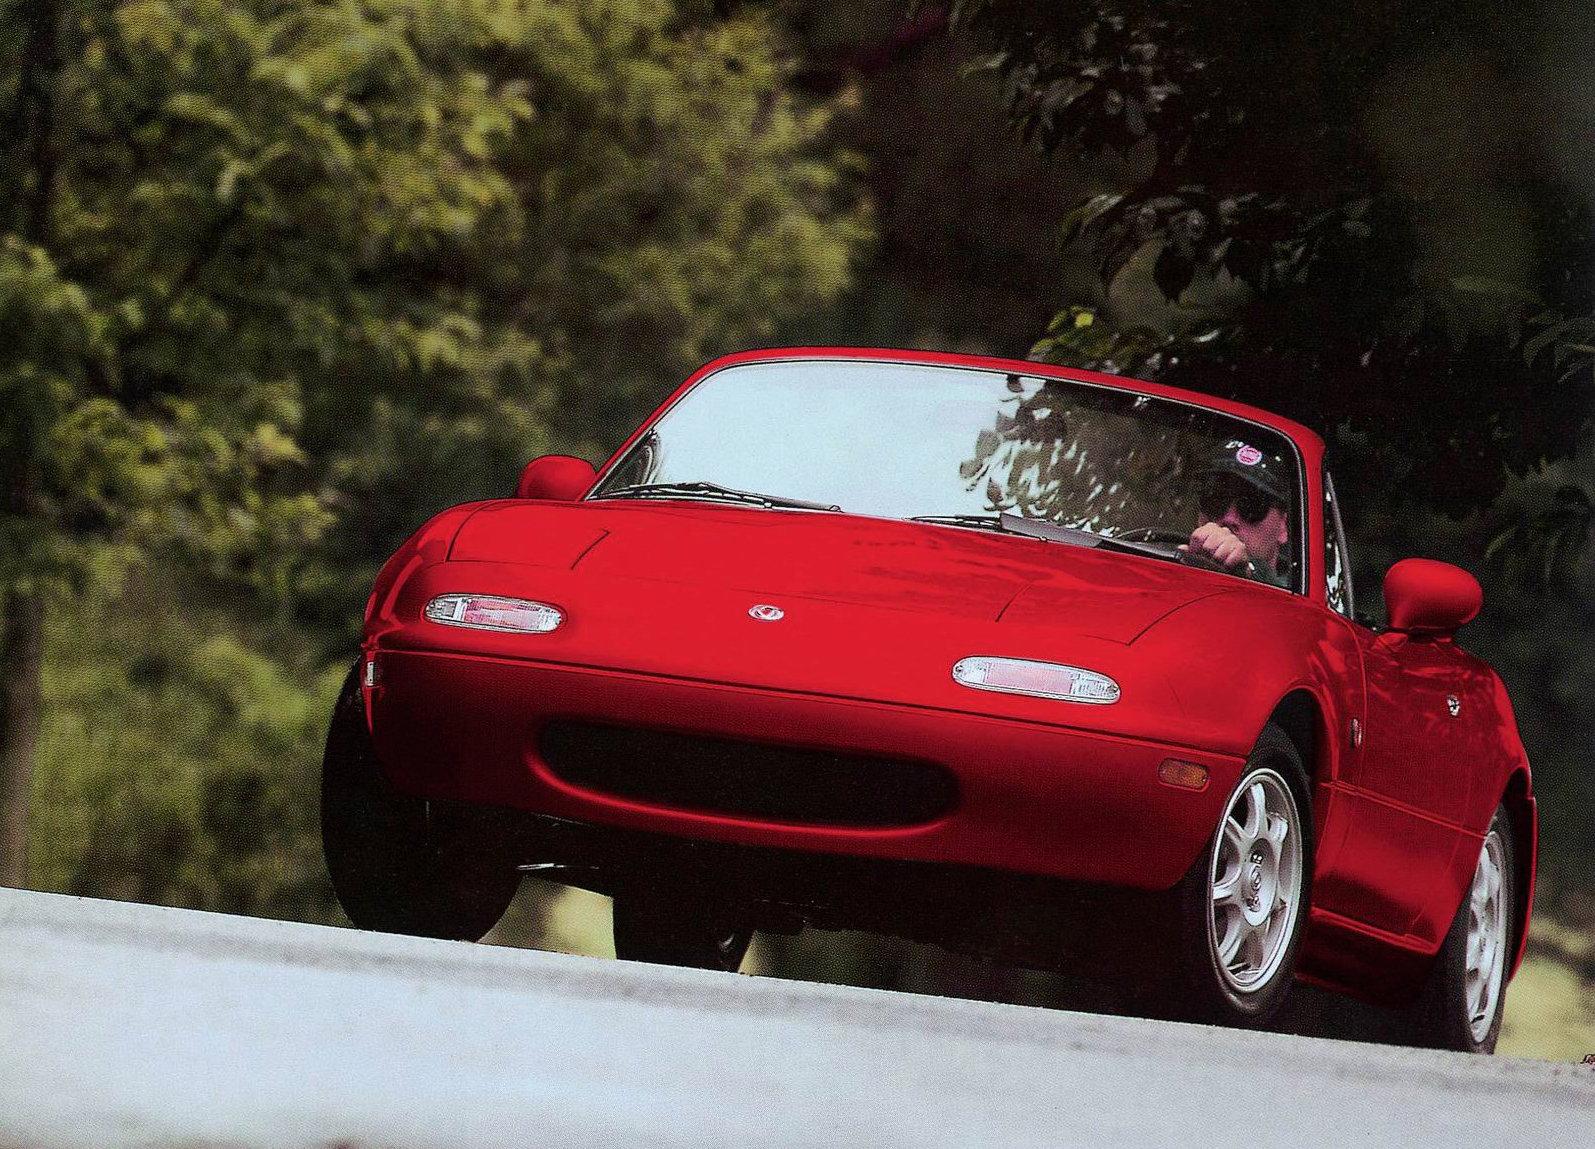 1990 Mazda MX-5 Miata front 3/4 forrest